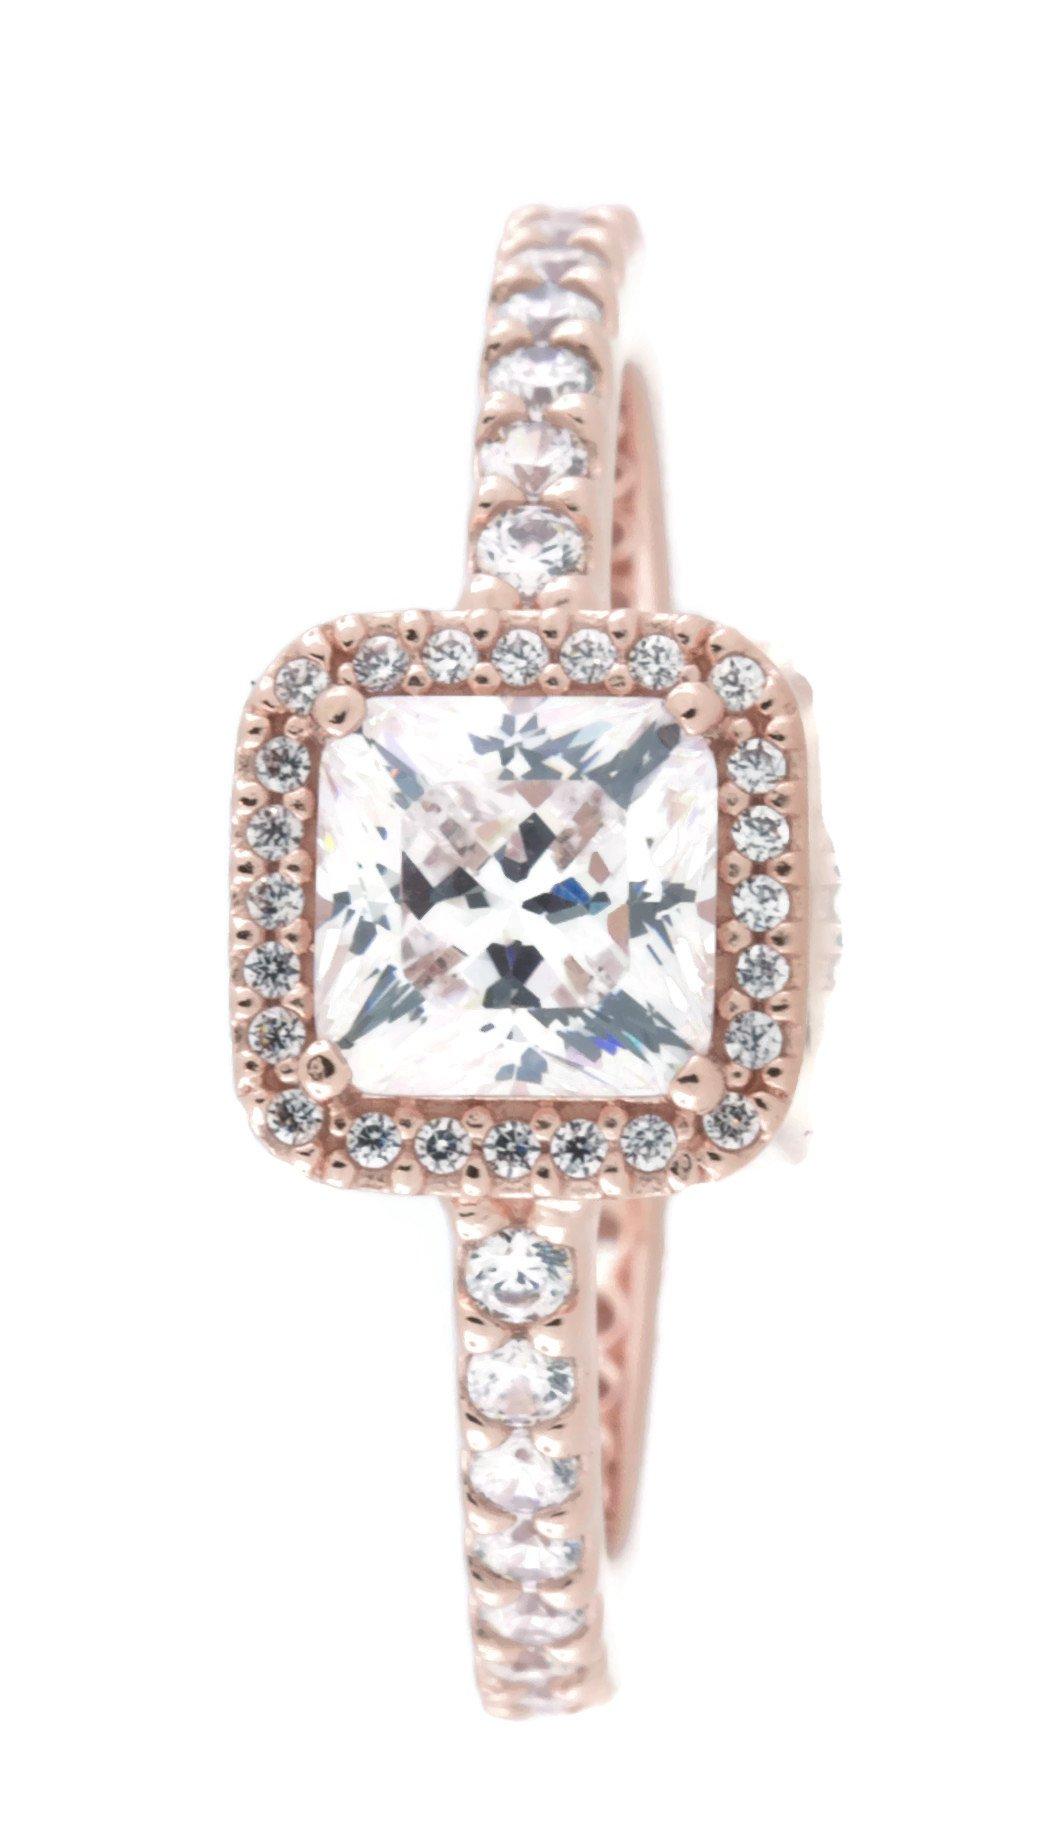 Pandora Timeless Elegance Ring, Pandora Rose, Clear CZ, 7 US, 180947CZ-54